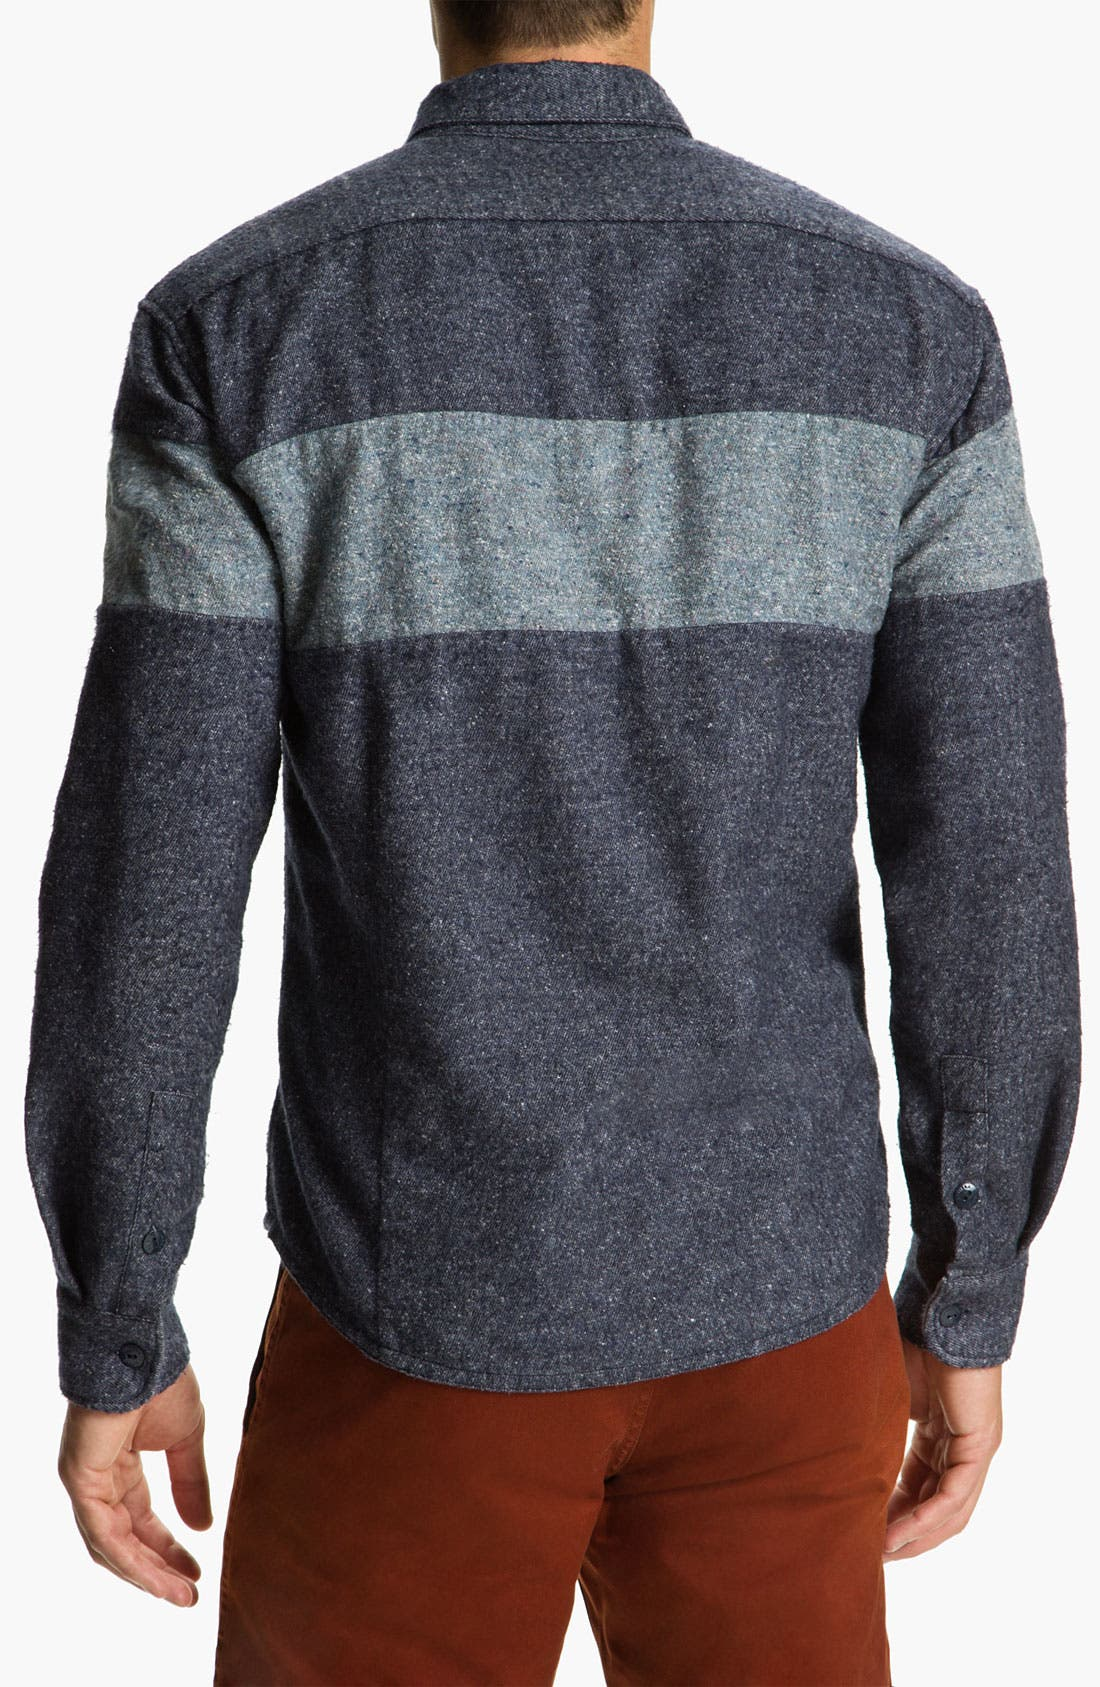 Alternate Image 2  - Riviera Club 'CPO' Woven Shirt Jacket